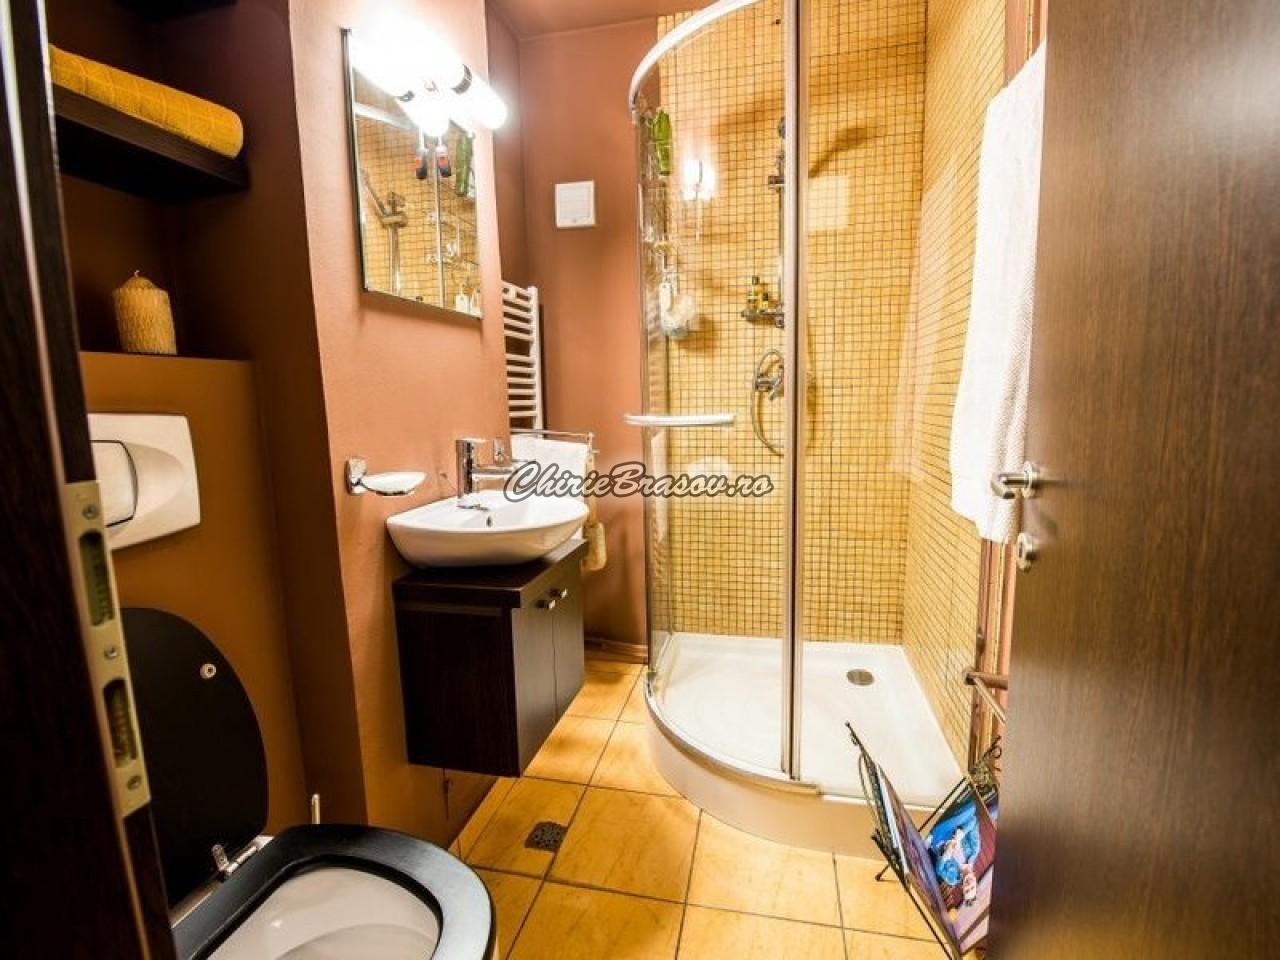 Inchiriere apartament 2 camere Brasov , Central - Grivitei-353-4